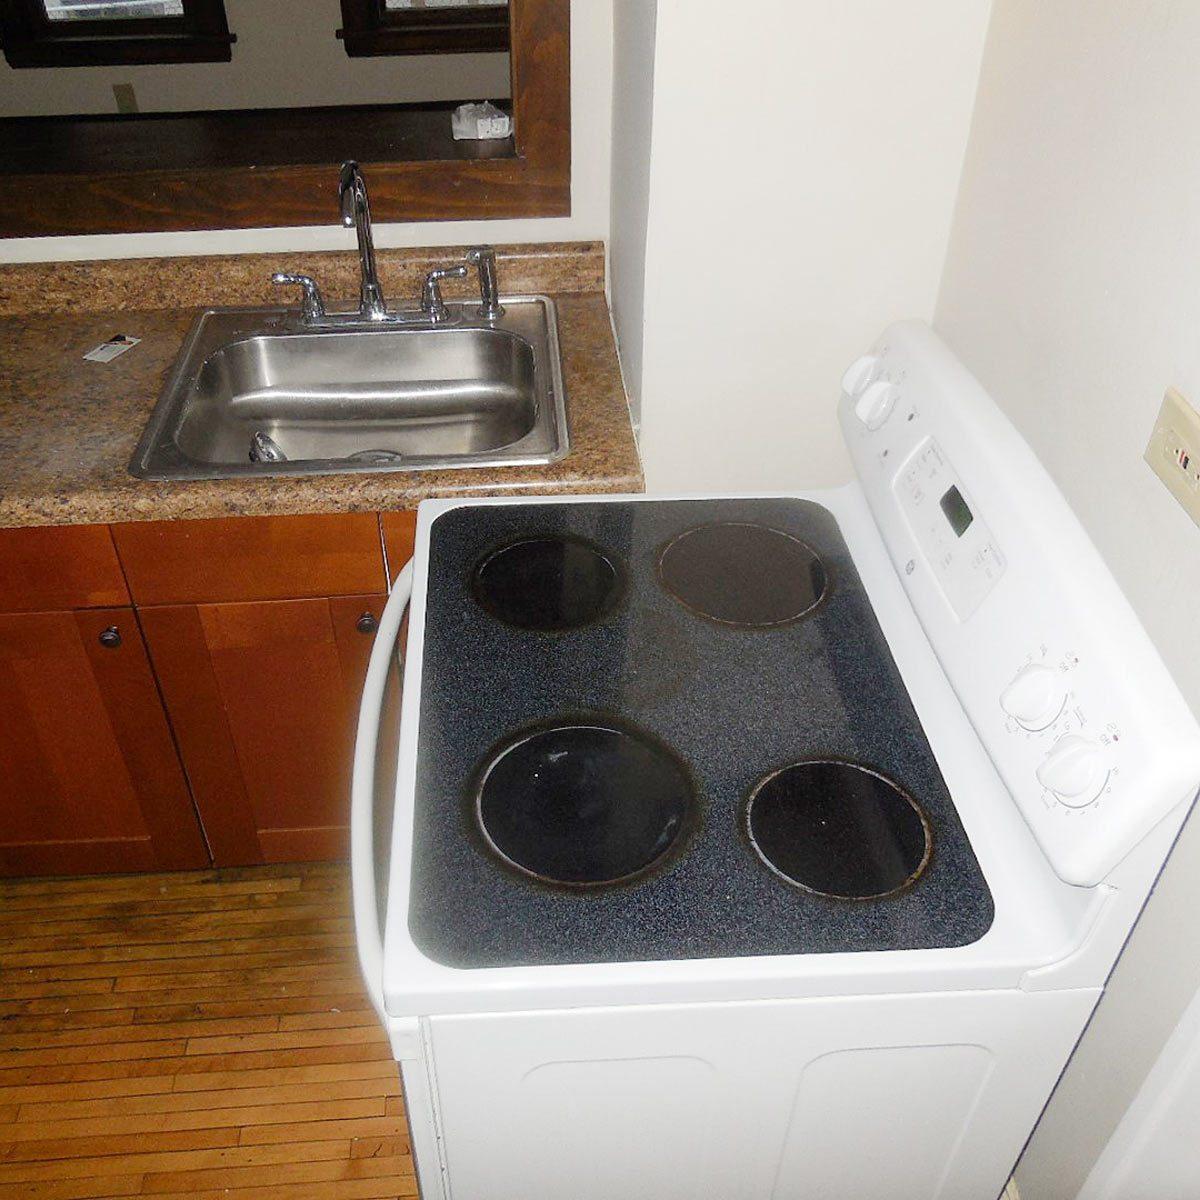 Kitchen Sink Quit Working: 100 Kitchen And Bath Updates That Destroy A Home's Value